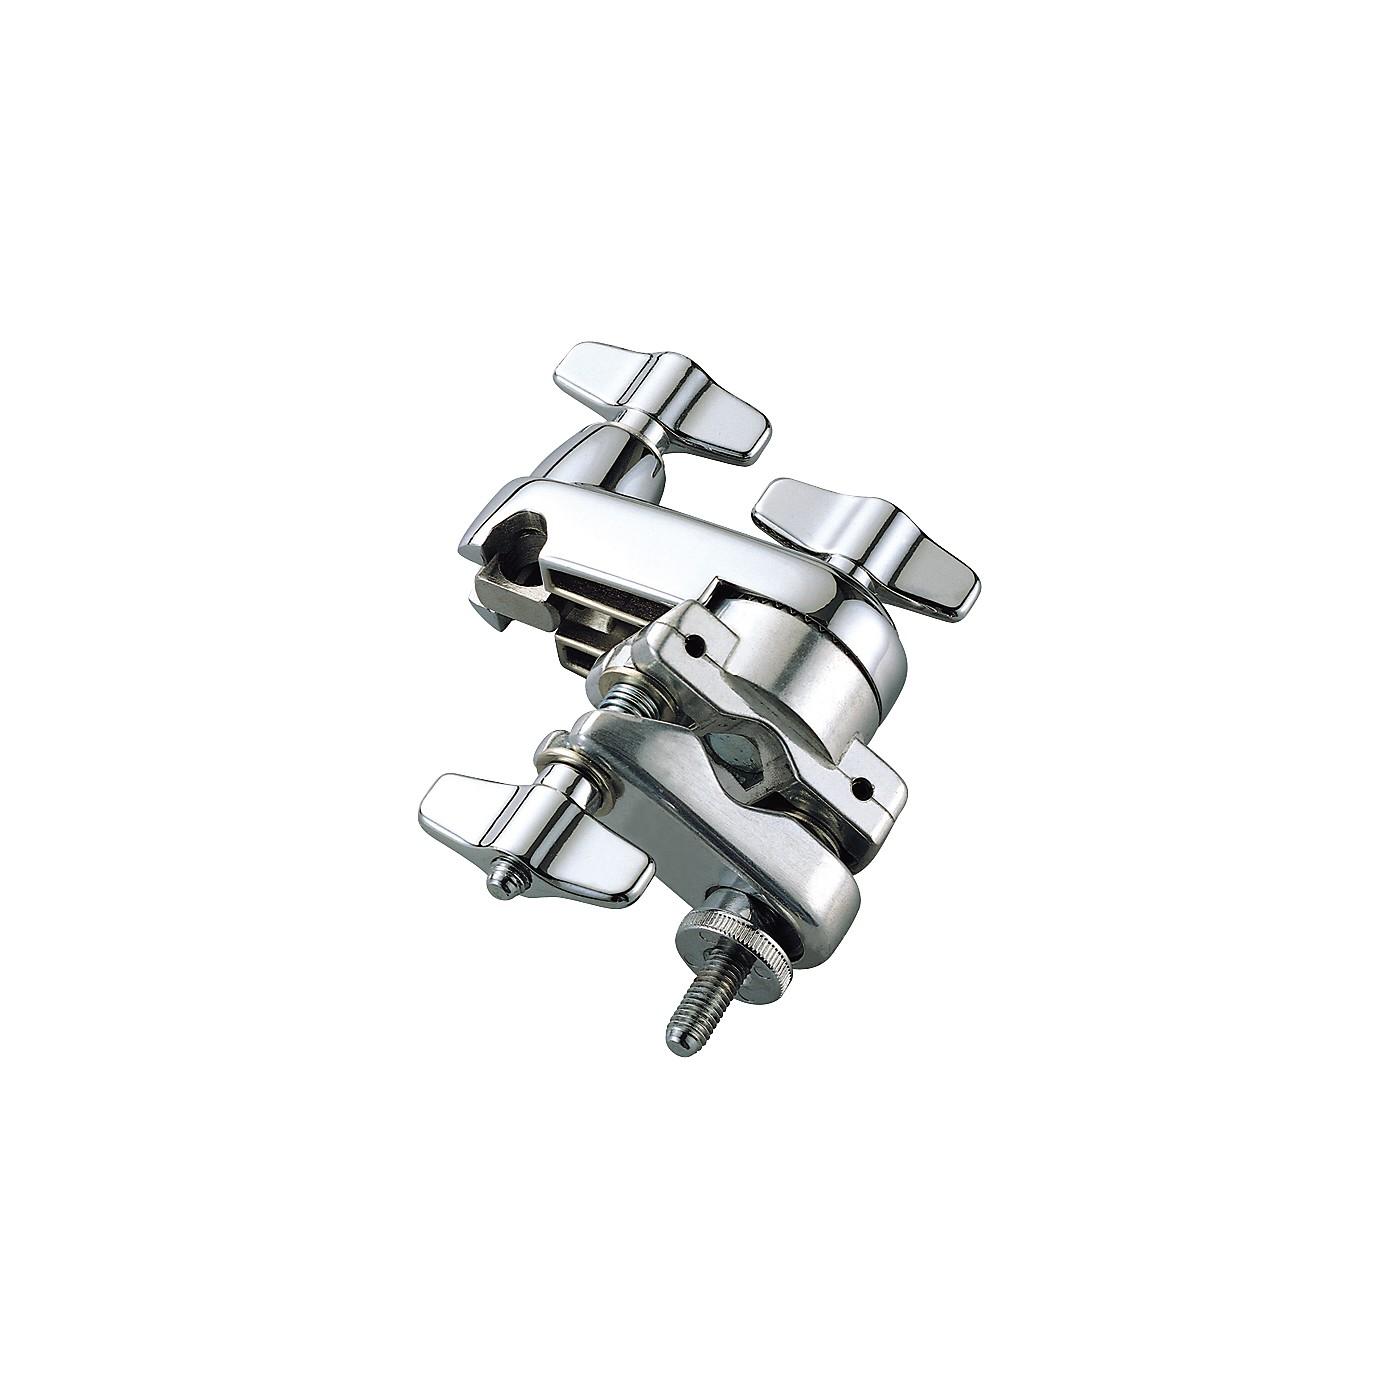 TAMA MC7 Compact Multi Clamp thumbnail